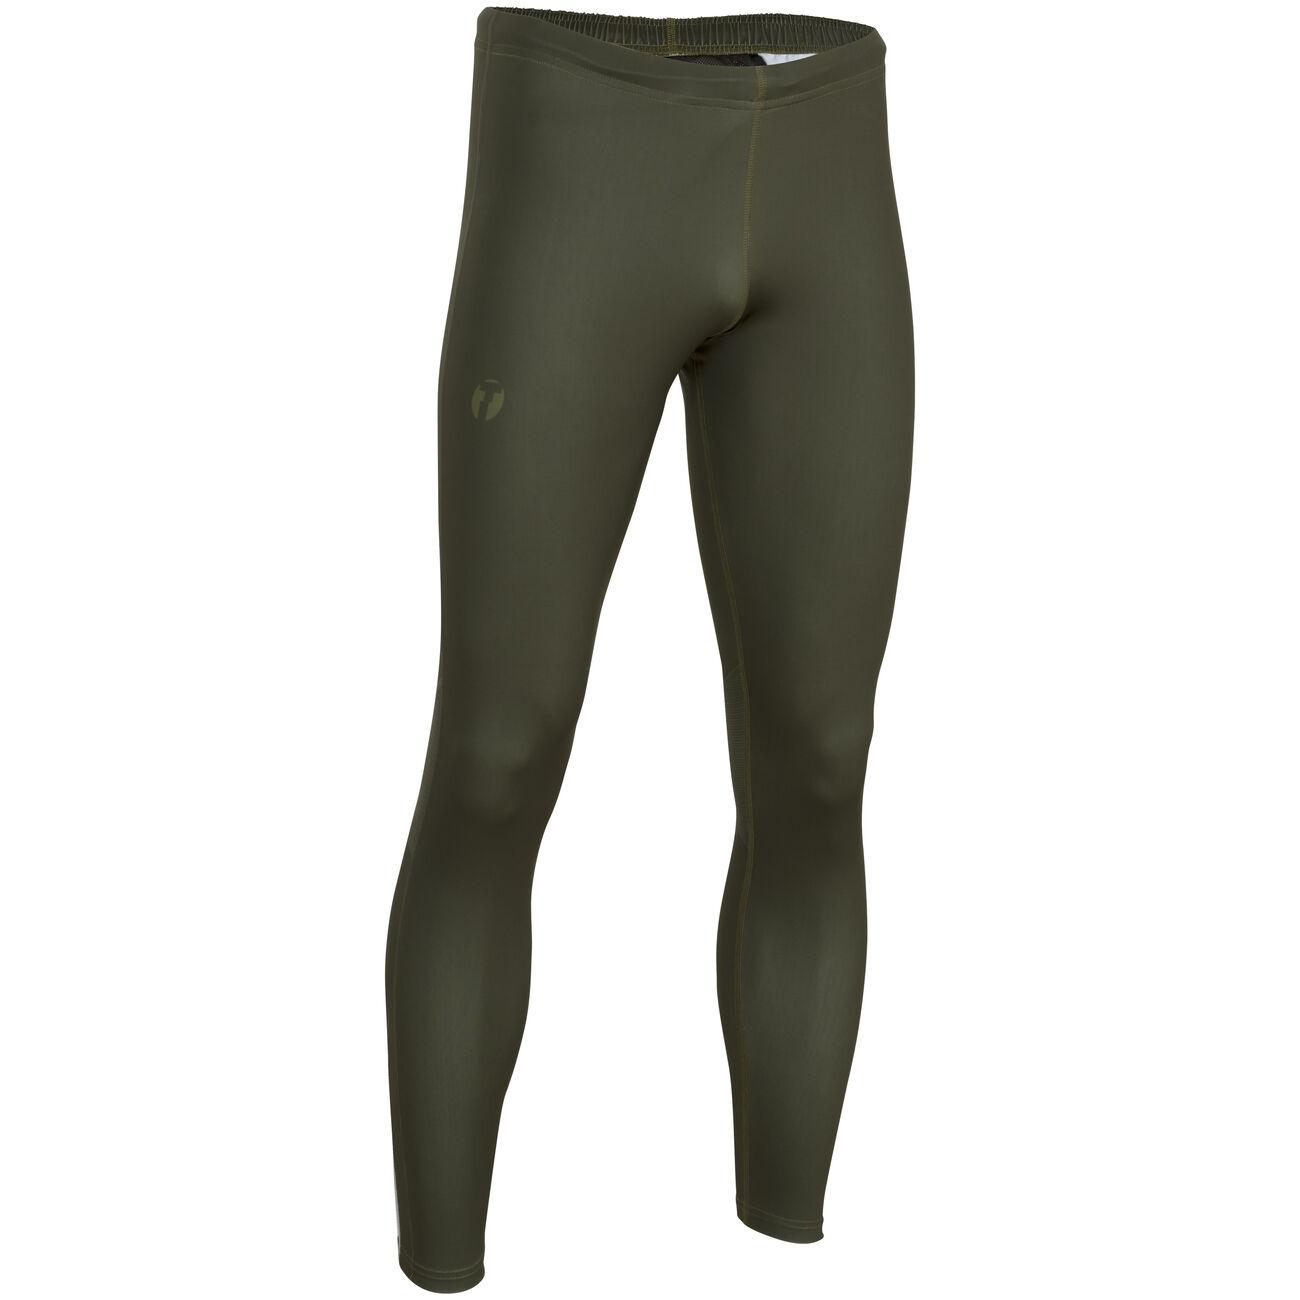 Run 2.0 tights men's